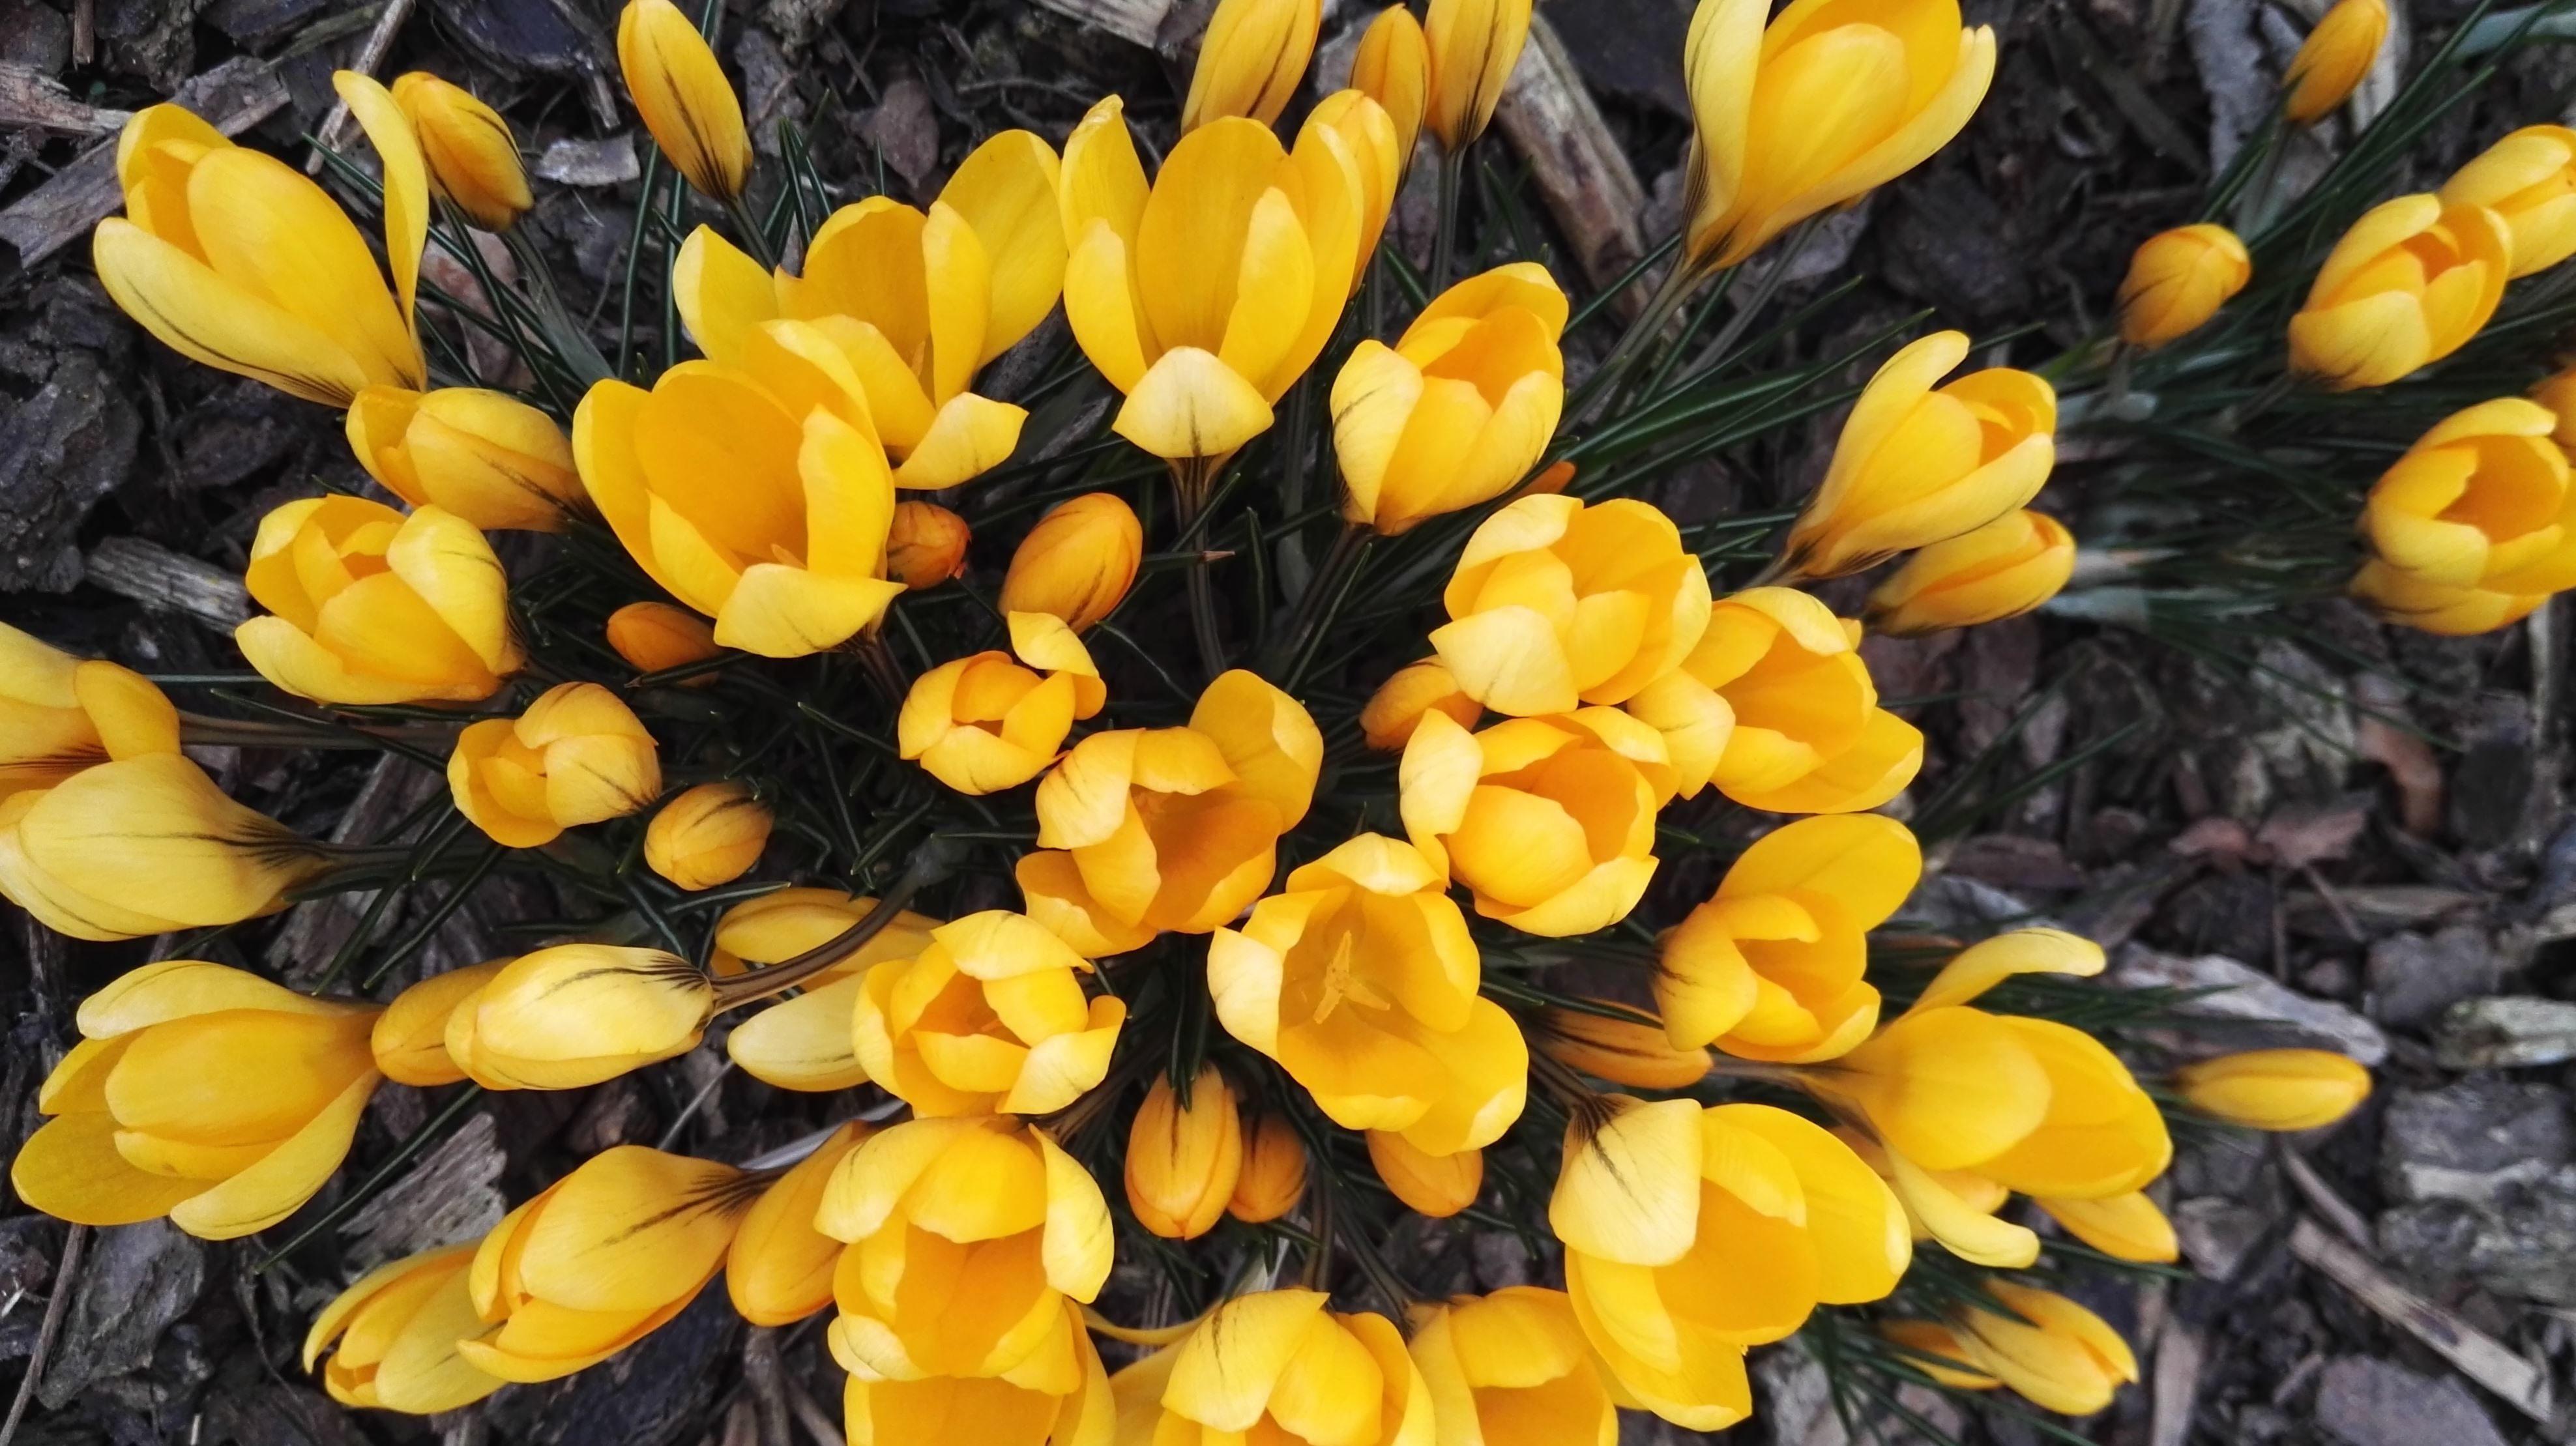 Free picture tulips yellow flowers beautiful bloom blooming tulips yellow flowers beautiful bloom blooming blossom botanic garden mightylinksfo